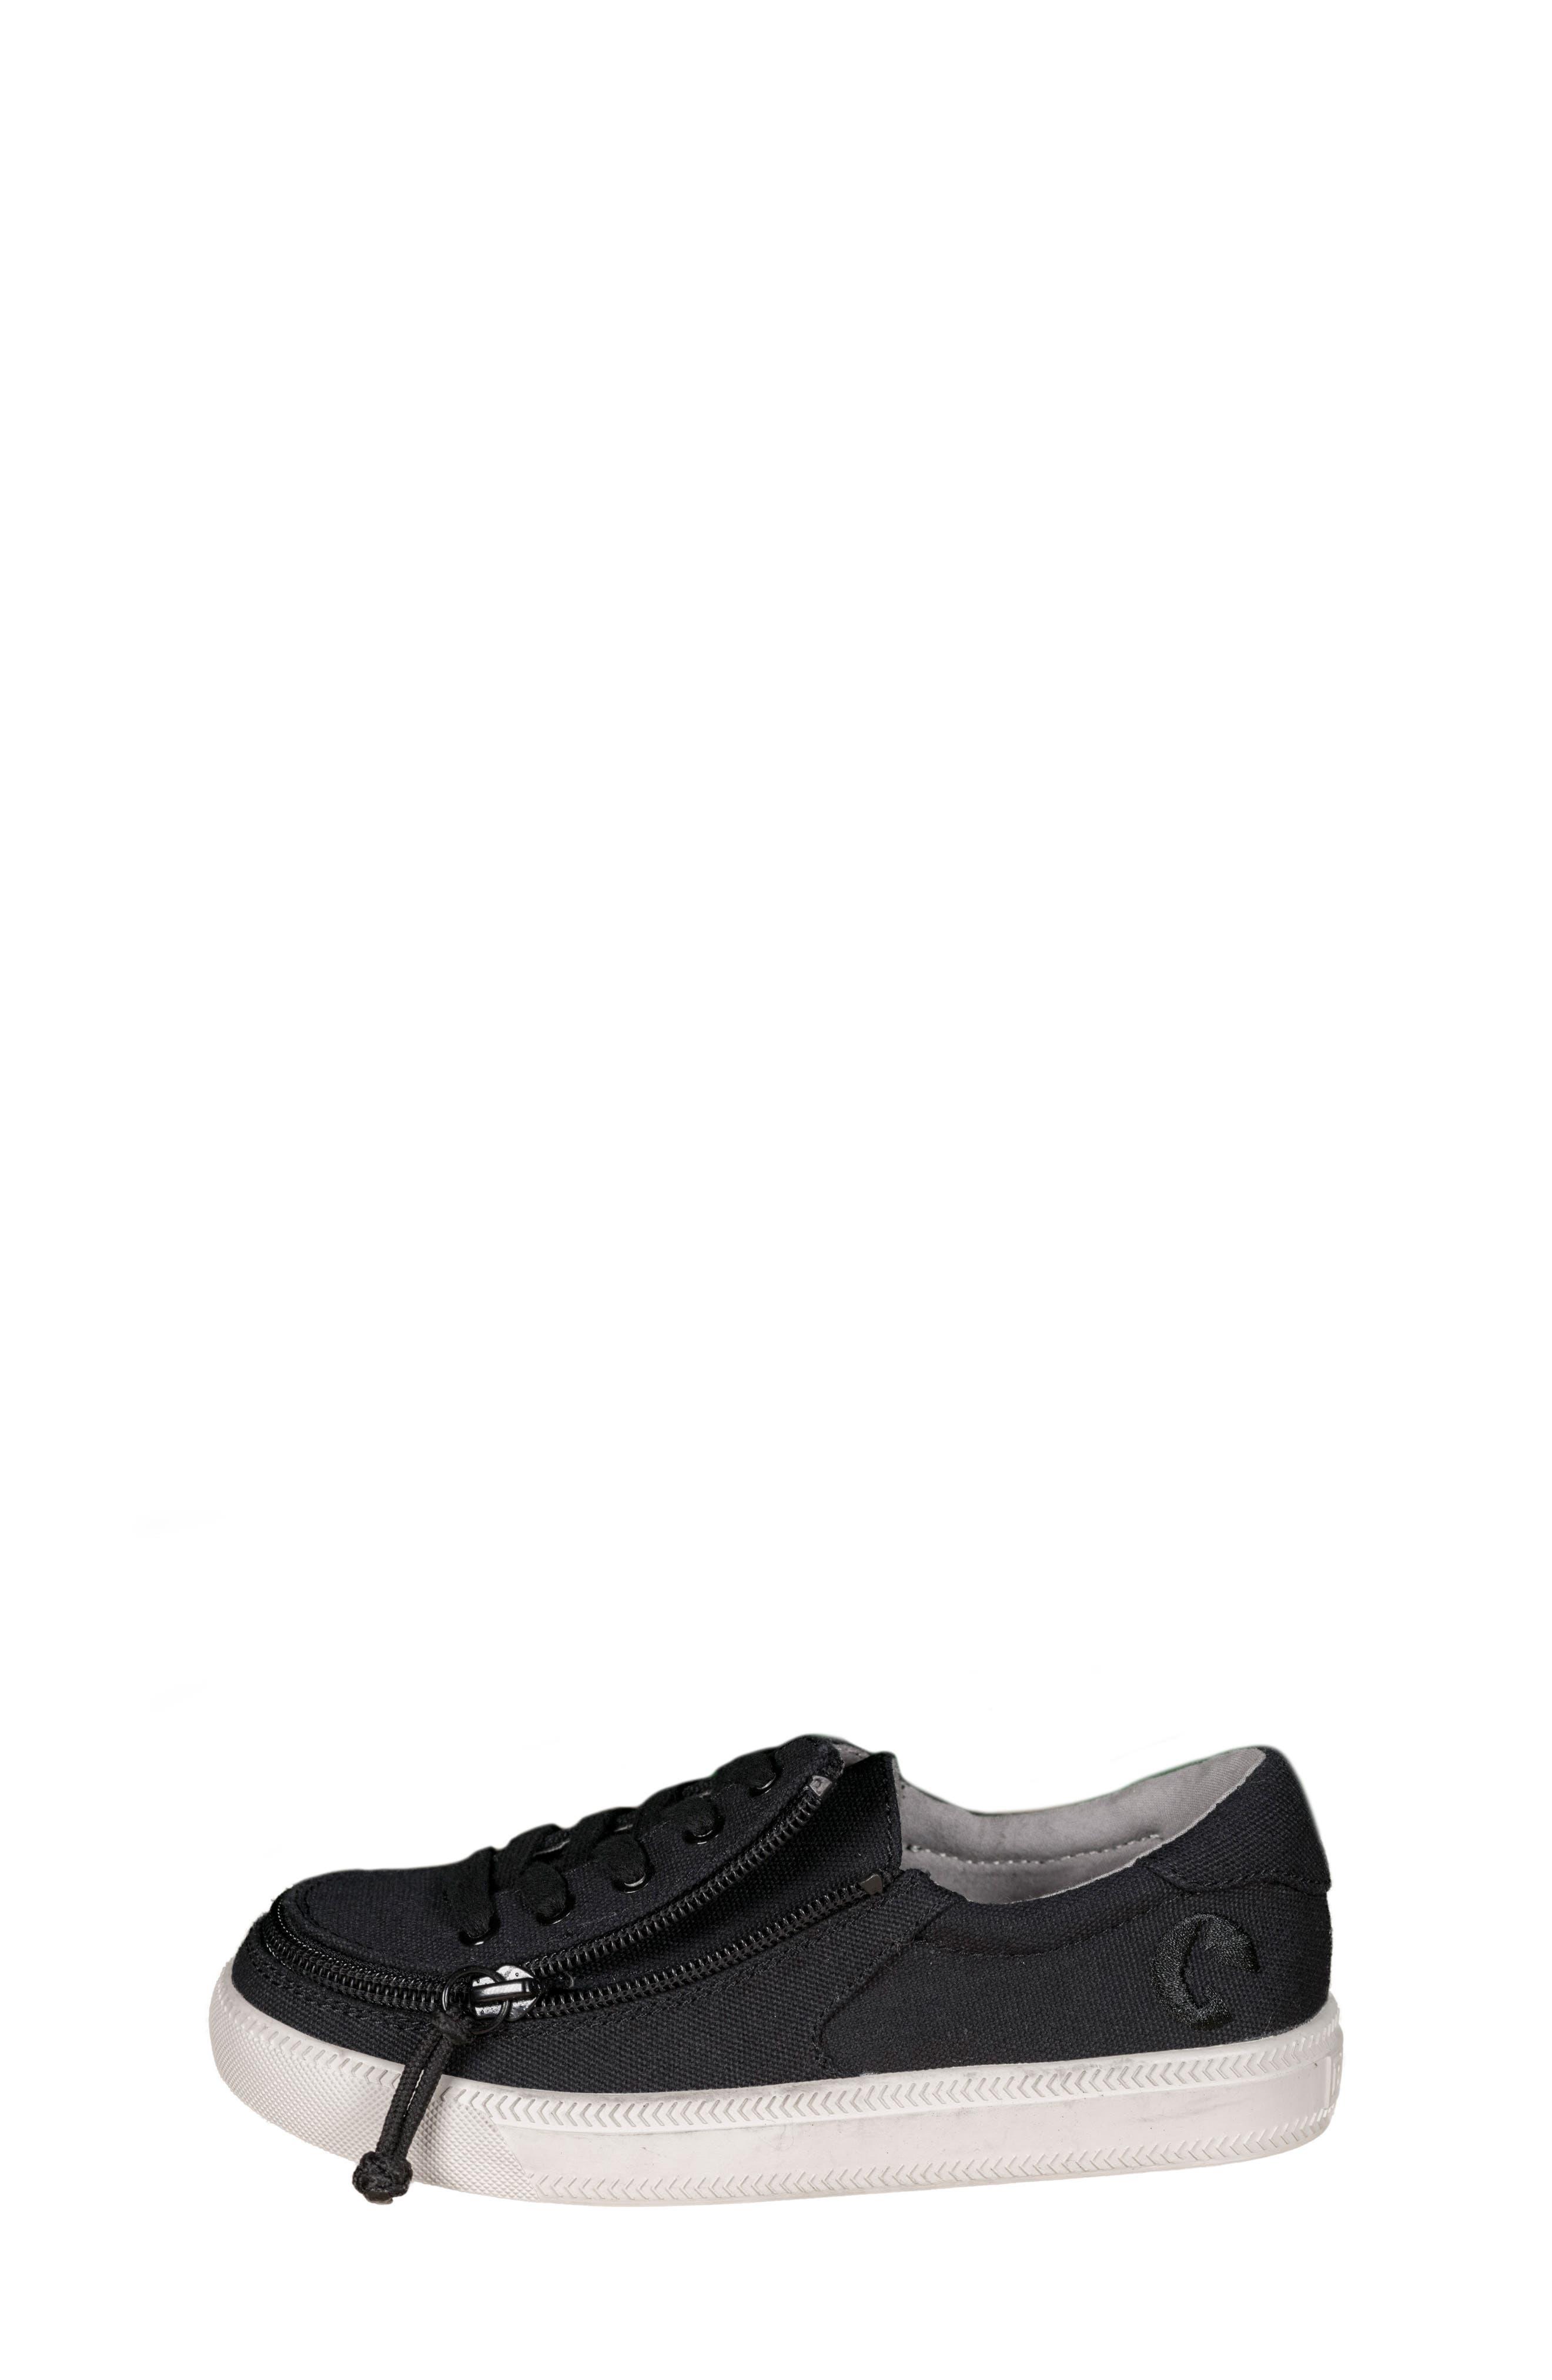 Classic Zip Around Low Top Sneaker, video thumbnail